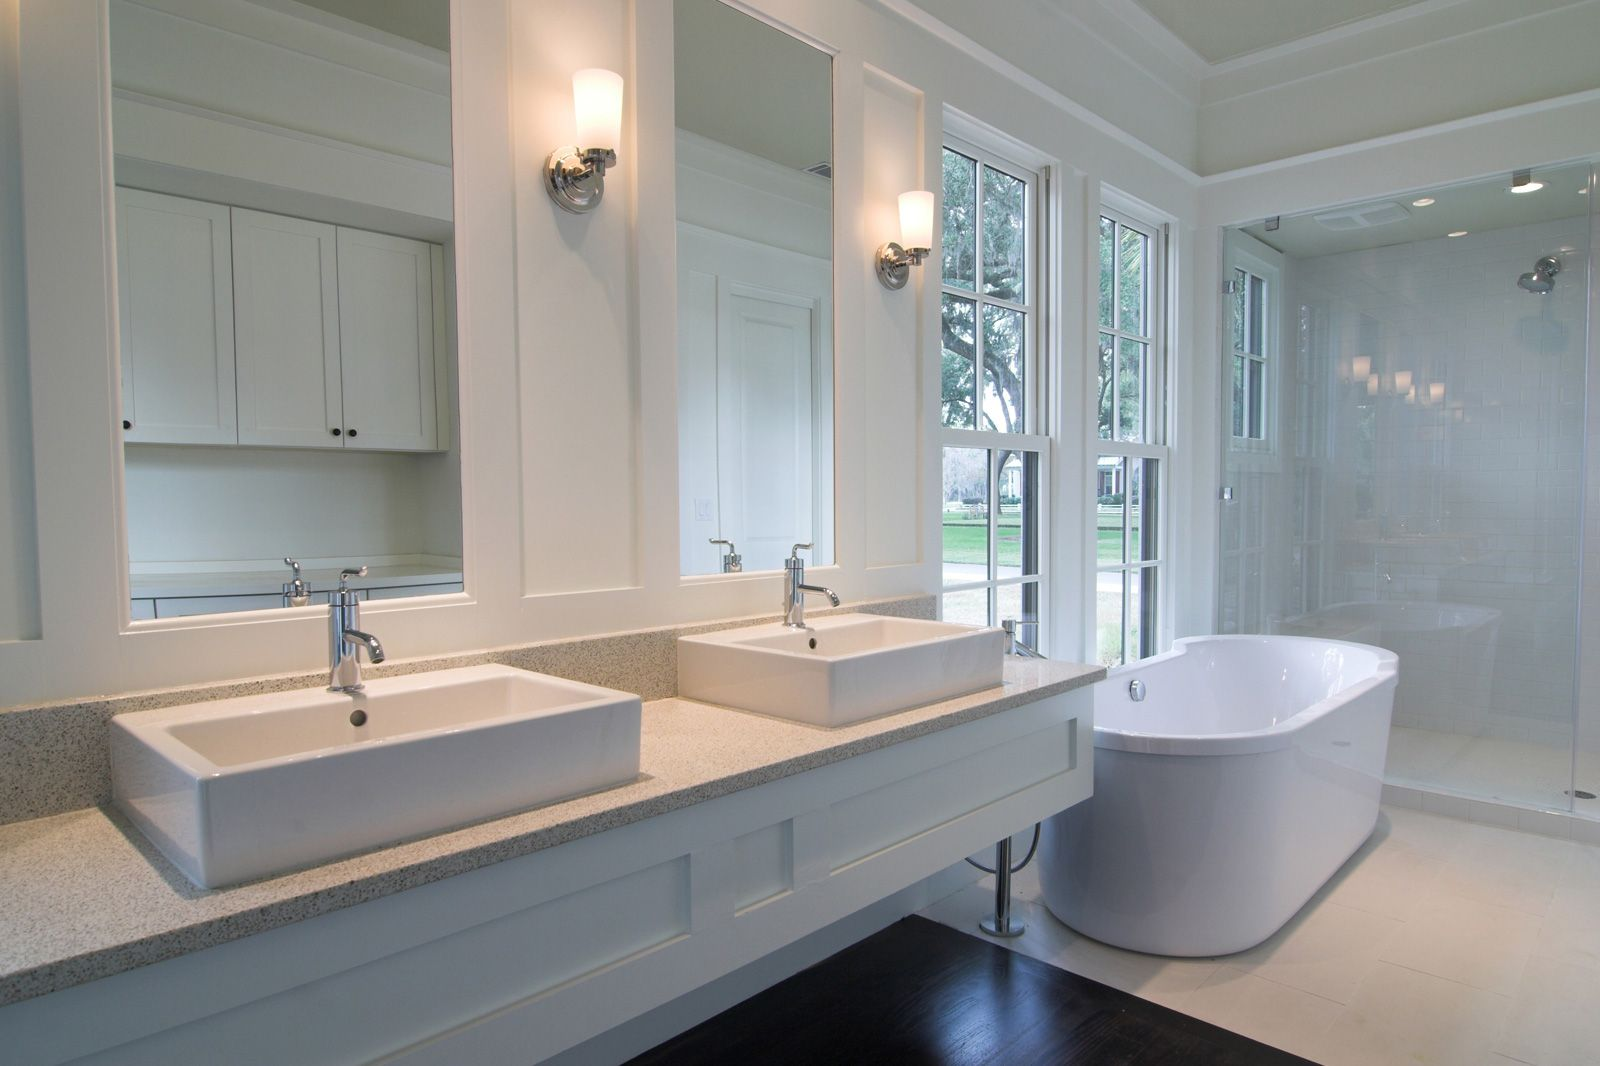 Benefits Of A Bathroom Remodel, Remodeling Your Bathroom